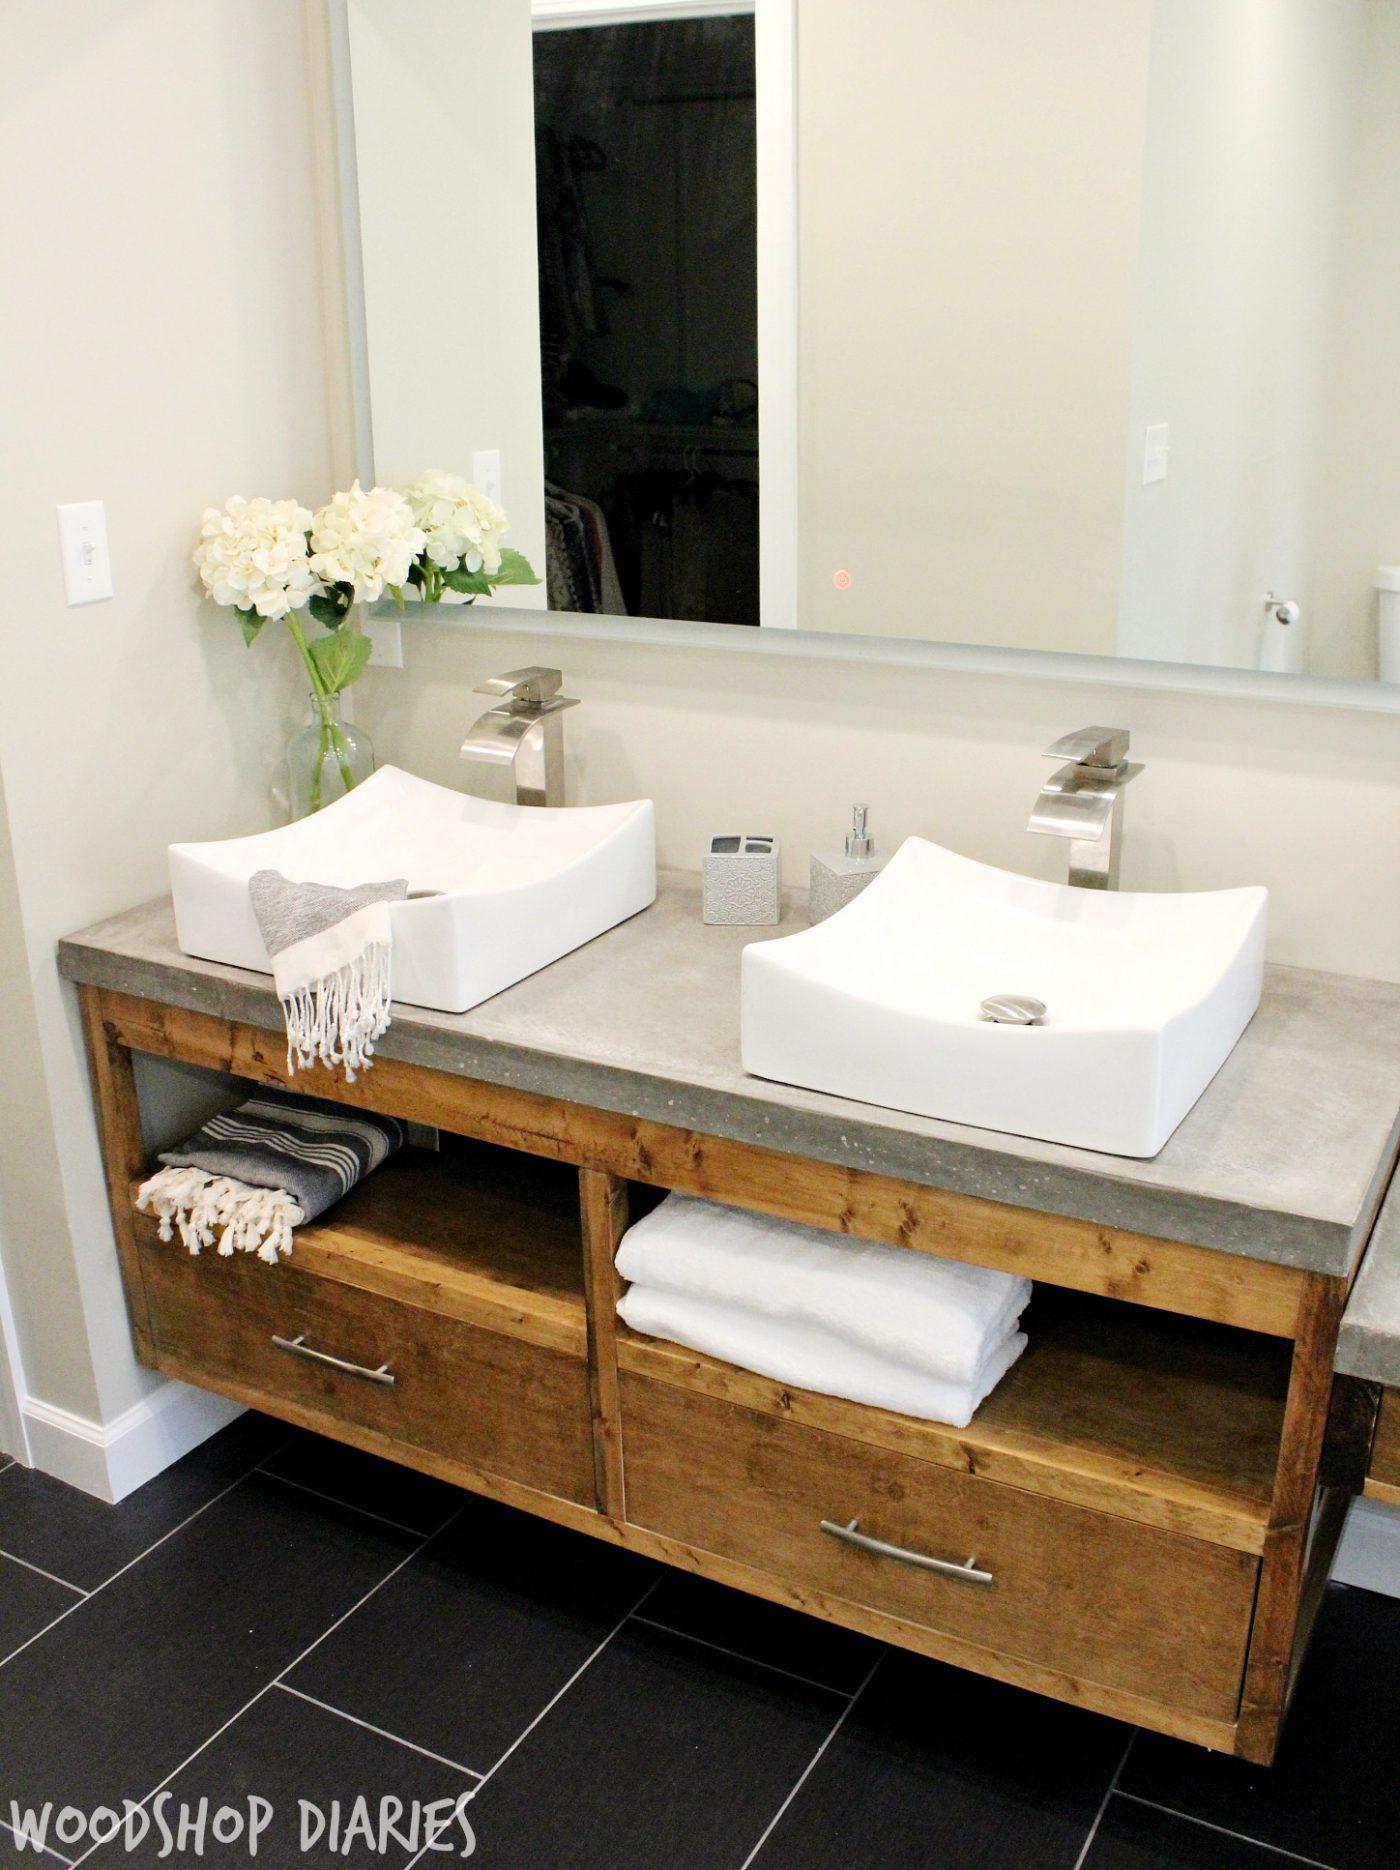 Modern Bathroom with DIY Floating vanity and